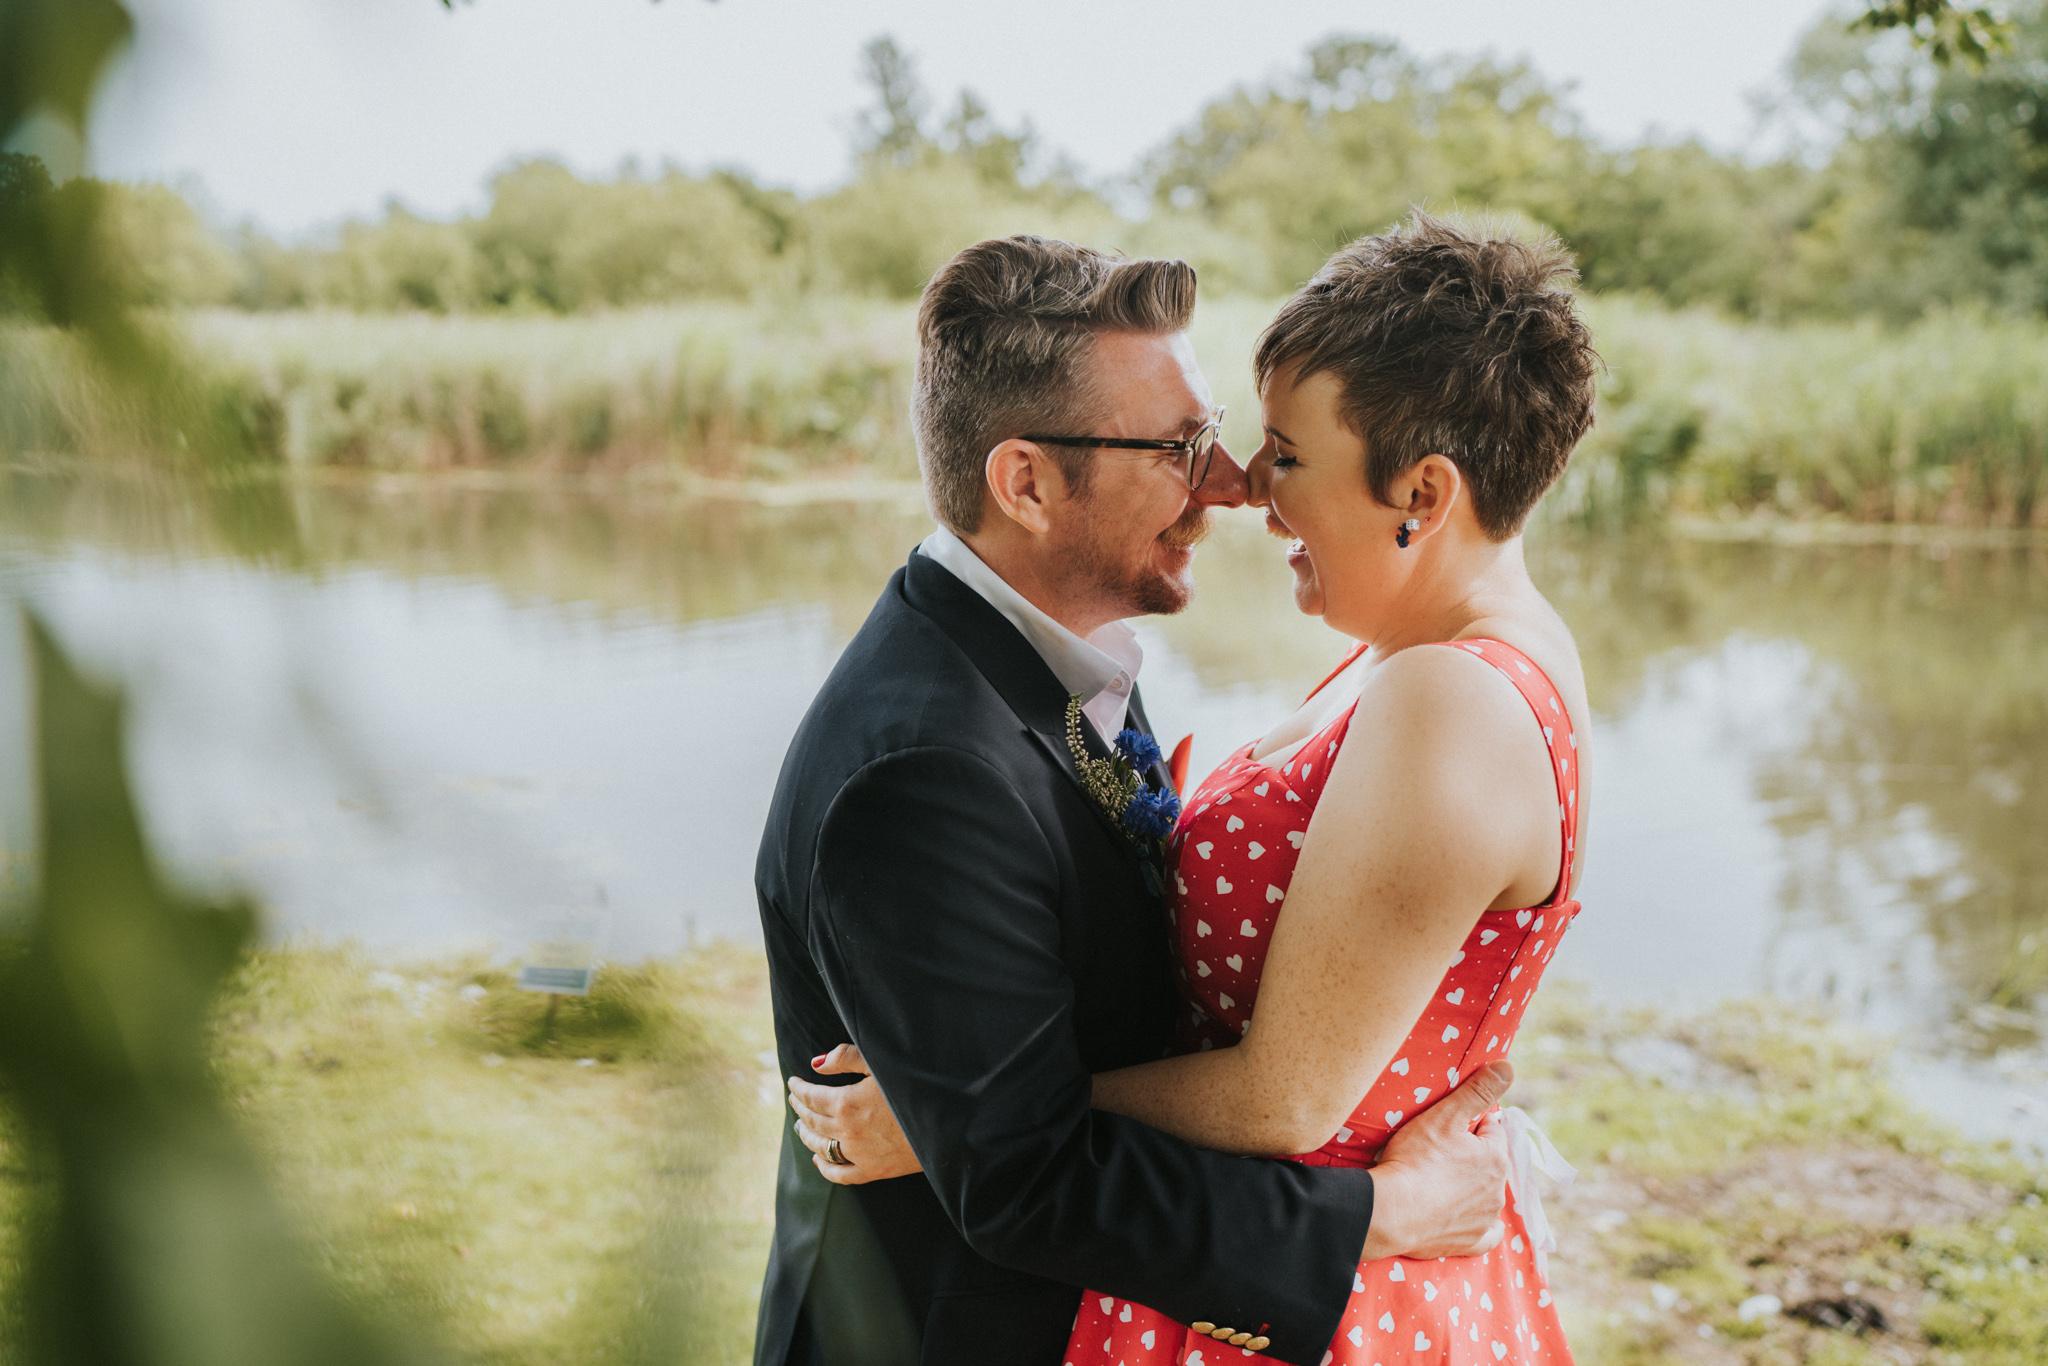 hannah-anthony-thorpeness-retro-diy-50s-wedding-grace-elizabeth-colchester-essex-alternative-wedding-lifestyle-photographer-essex-suffolk-norfolk-devon (34 of 39).jpg